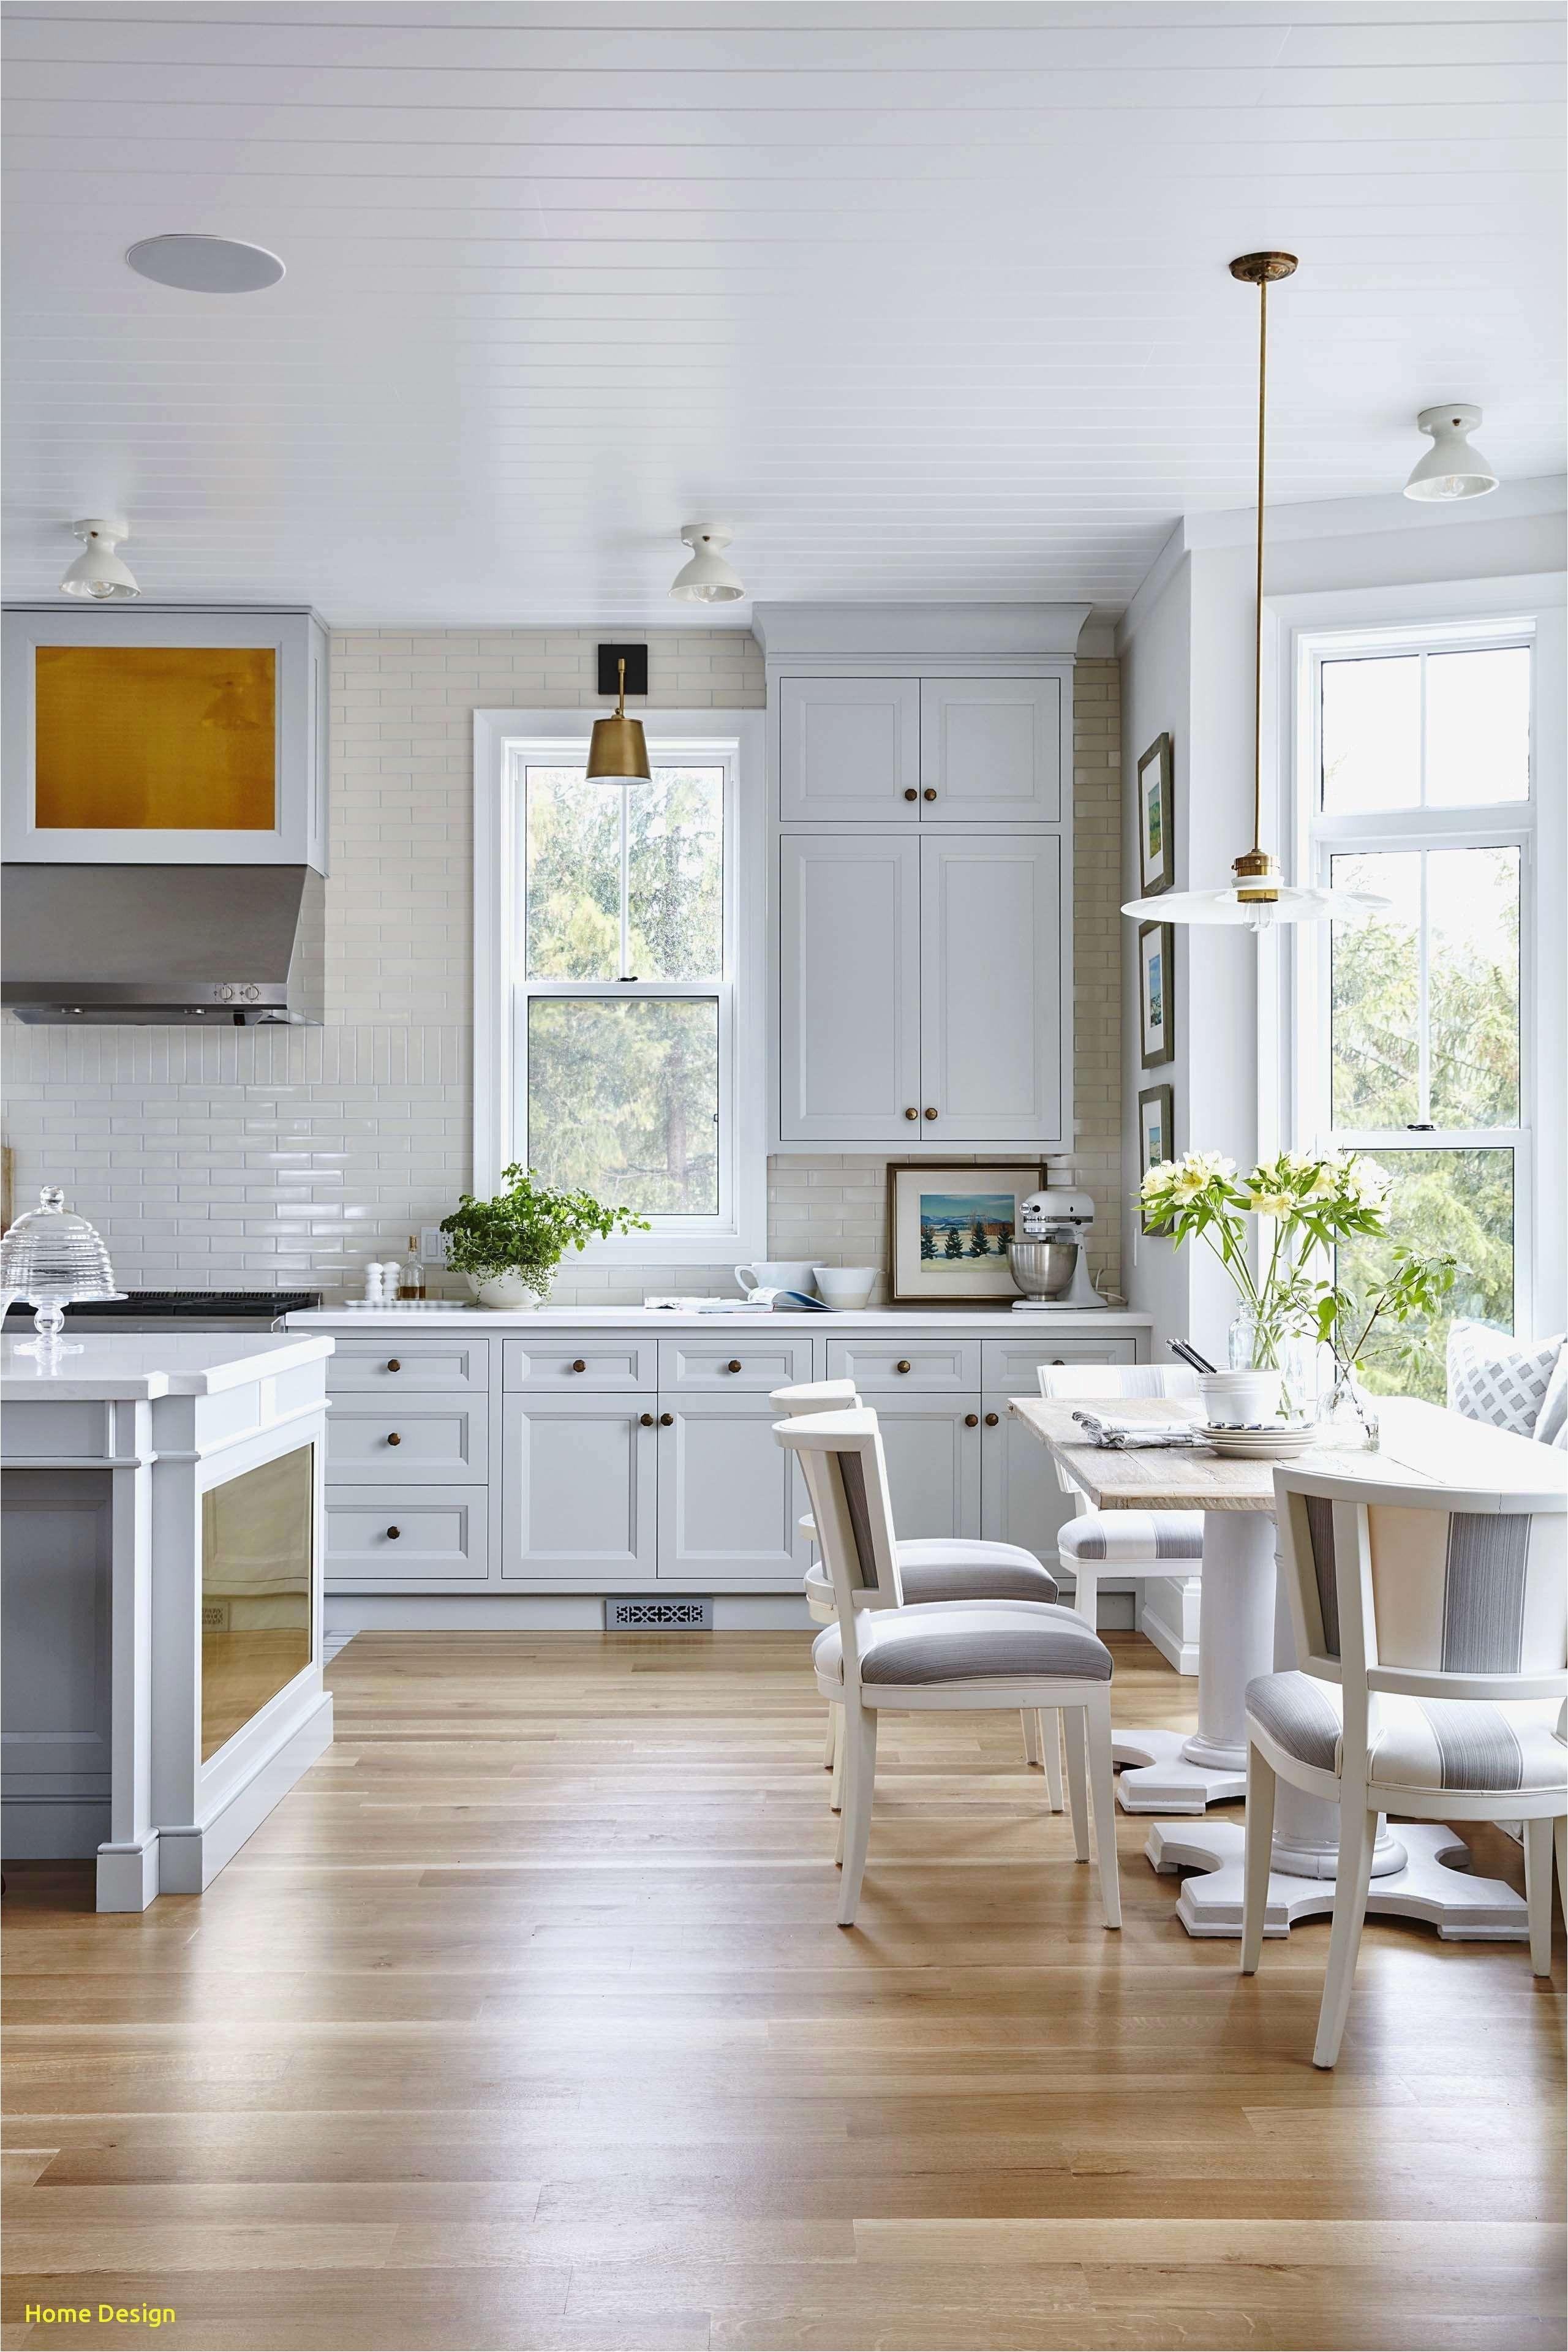 Bedroom Wallpaper Ideas Luxury A Small Room Decoration Best Kitchen Joys Kitchen Joys Kitchen 0d